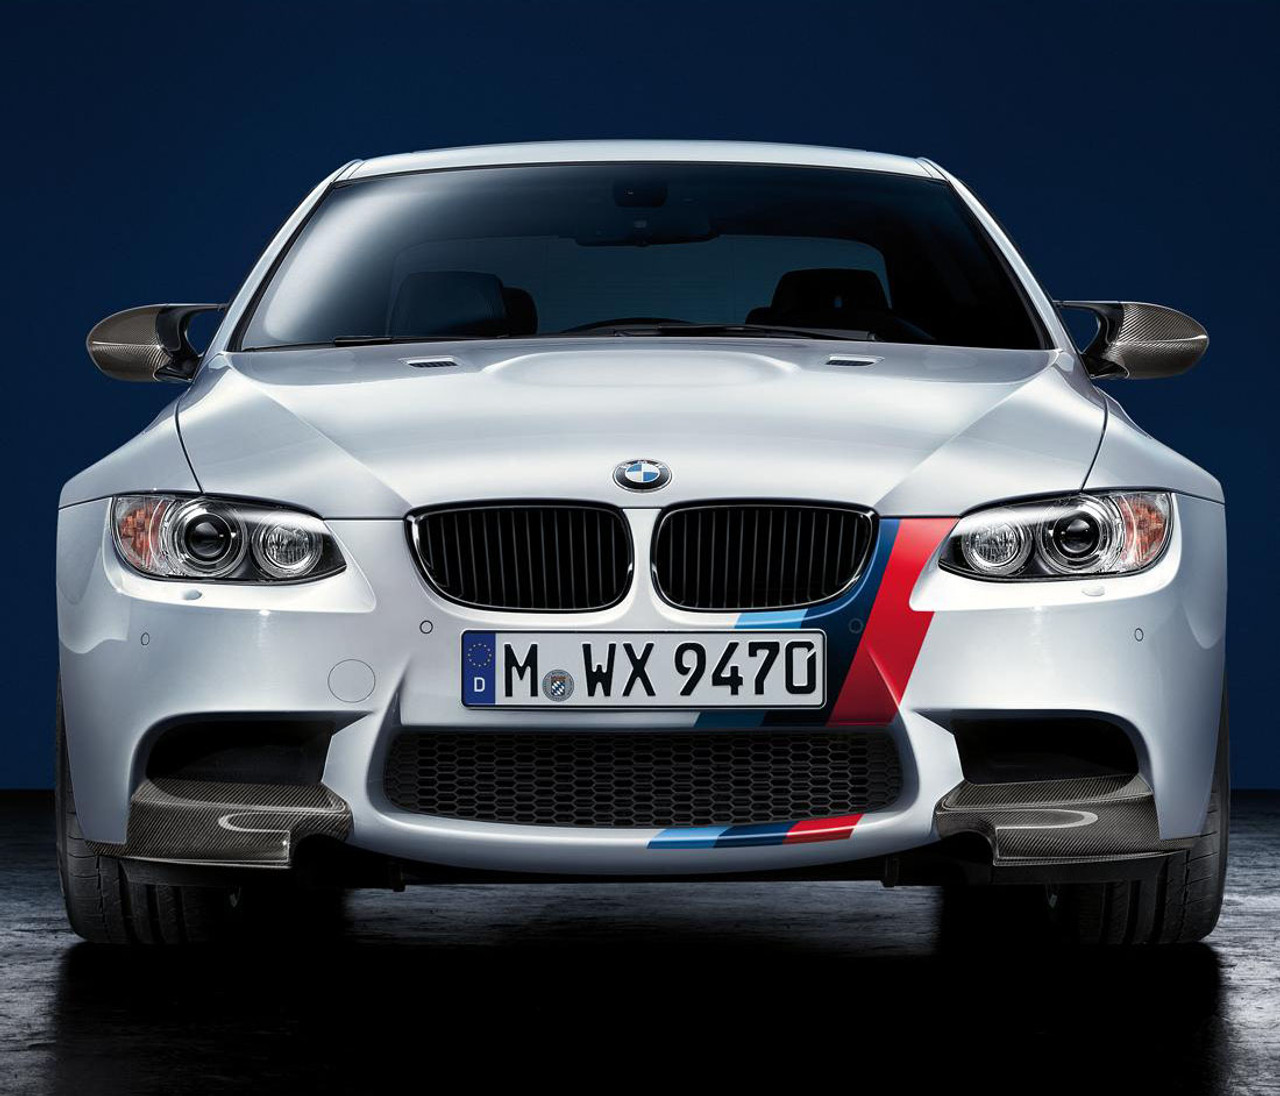 M Color Stripe Hood Side Sticker Decal For BMW M3 M4 F32 F82 E92 F80 G20 E90 F22